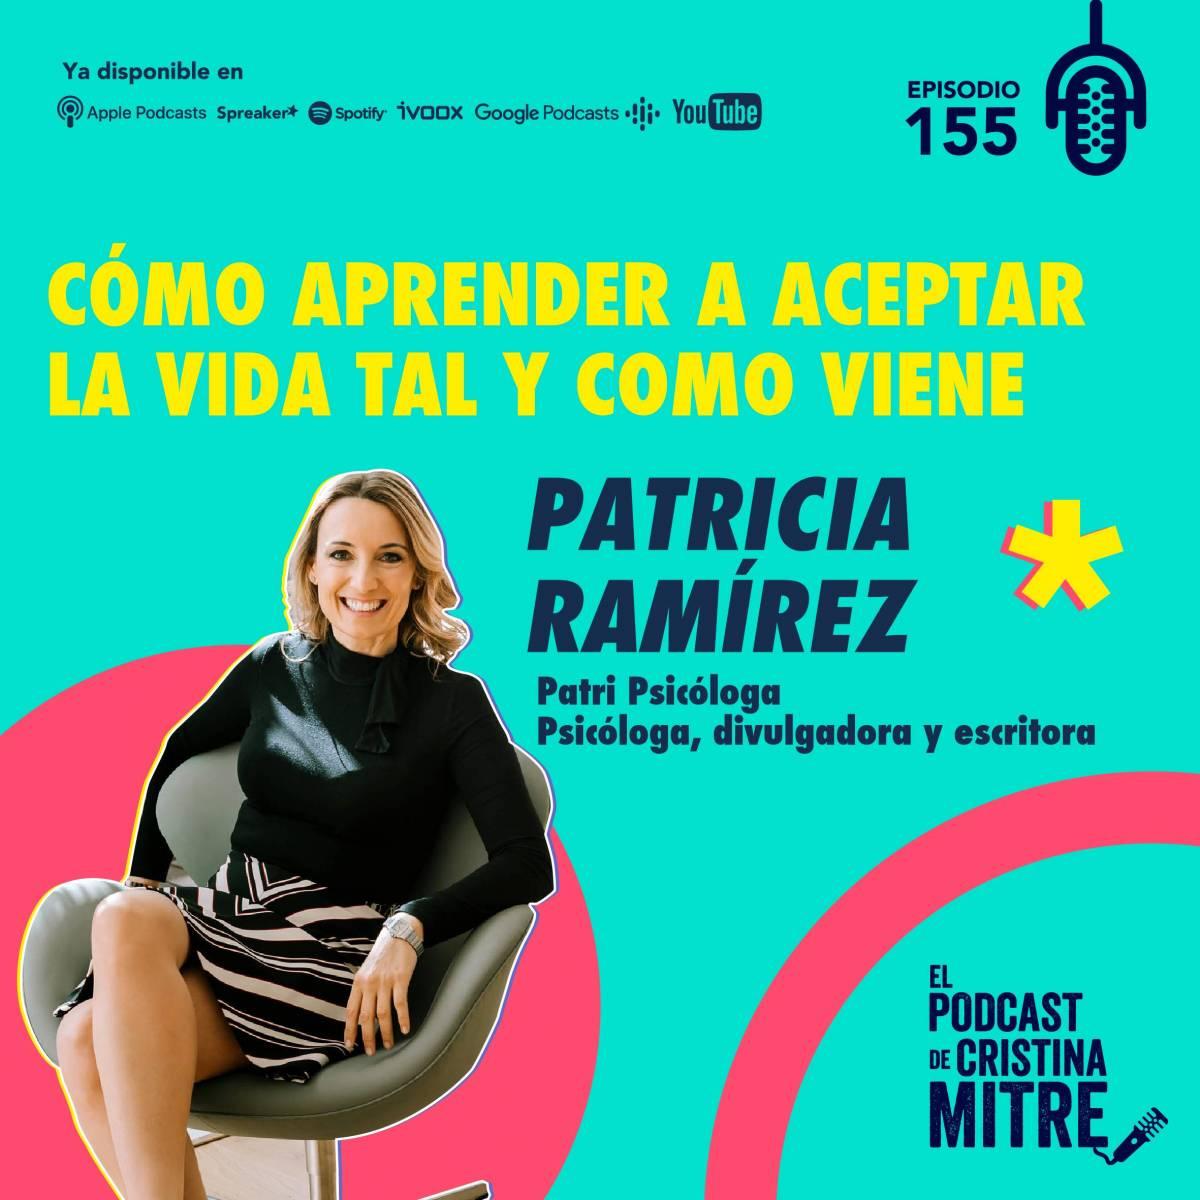 Patricia Ramírez Cristina Mitre adversidad